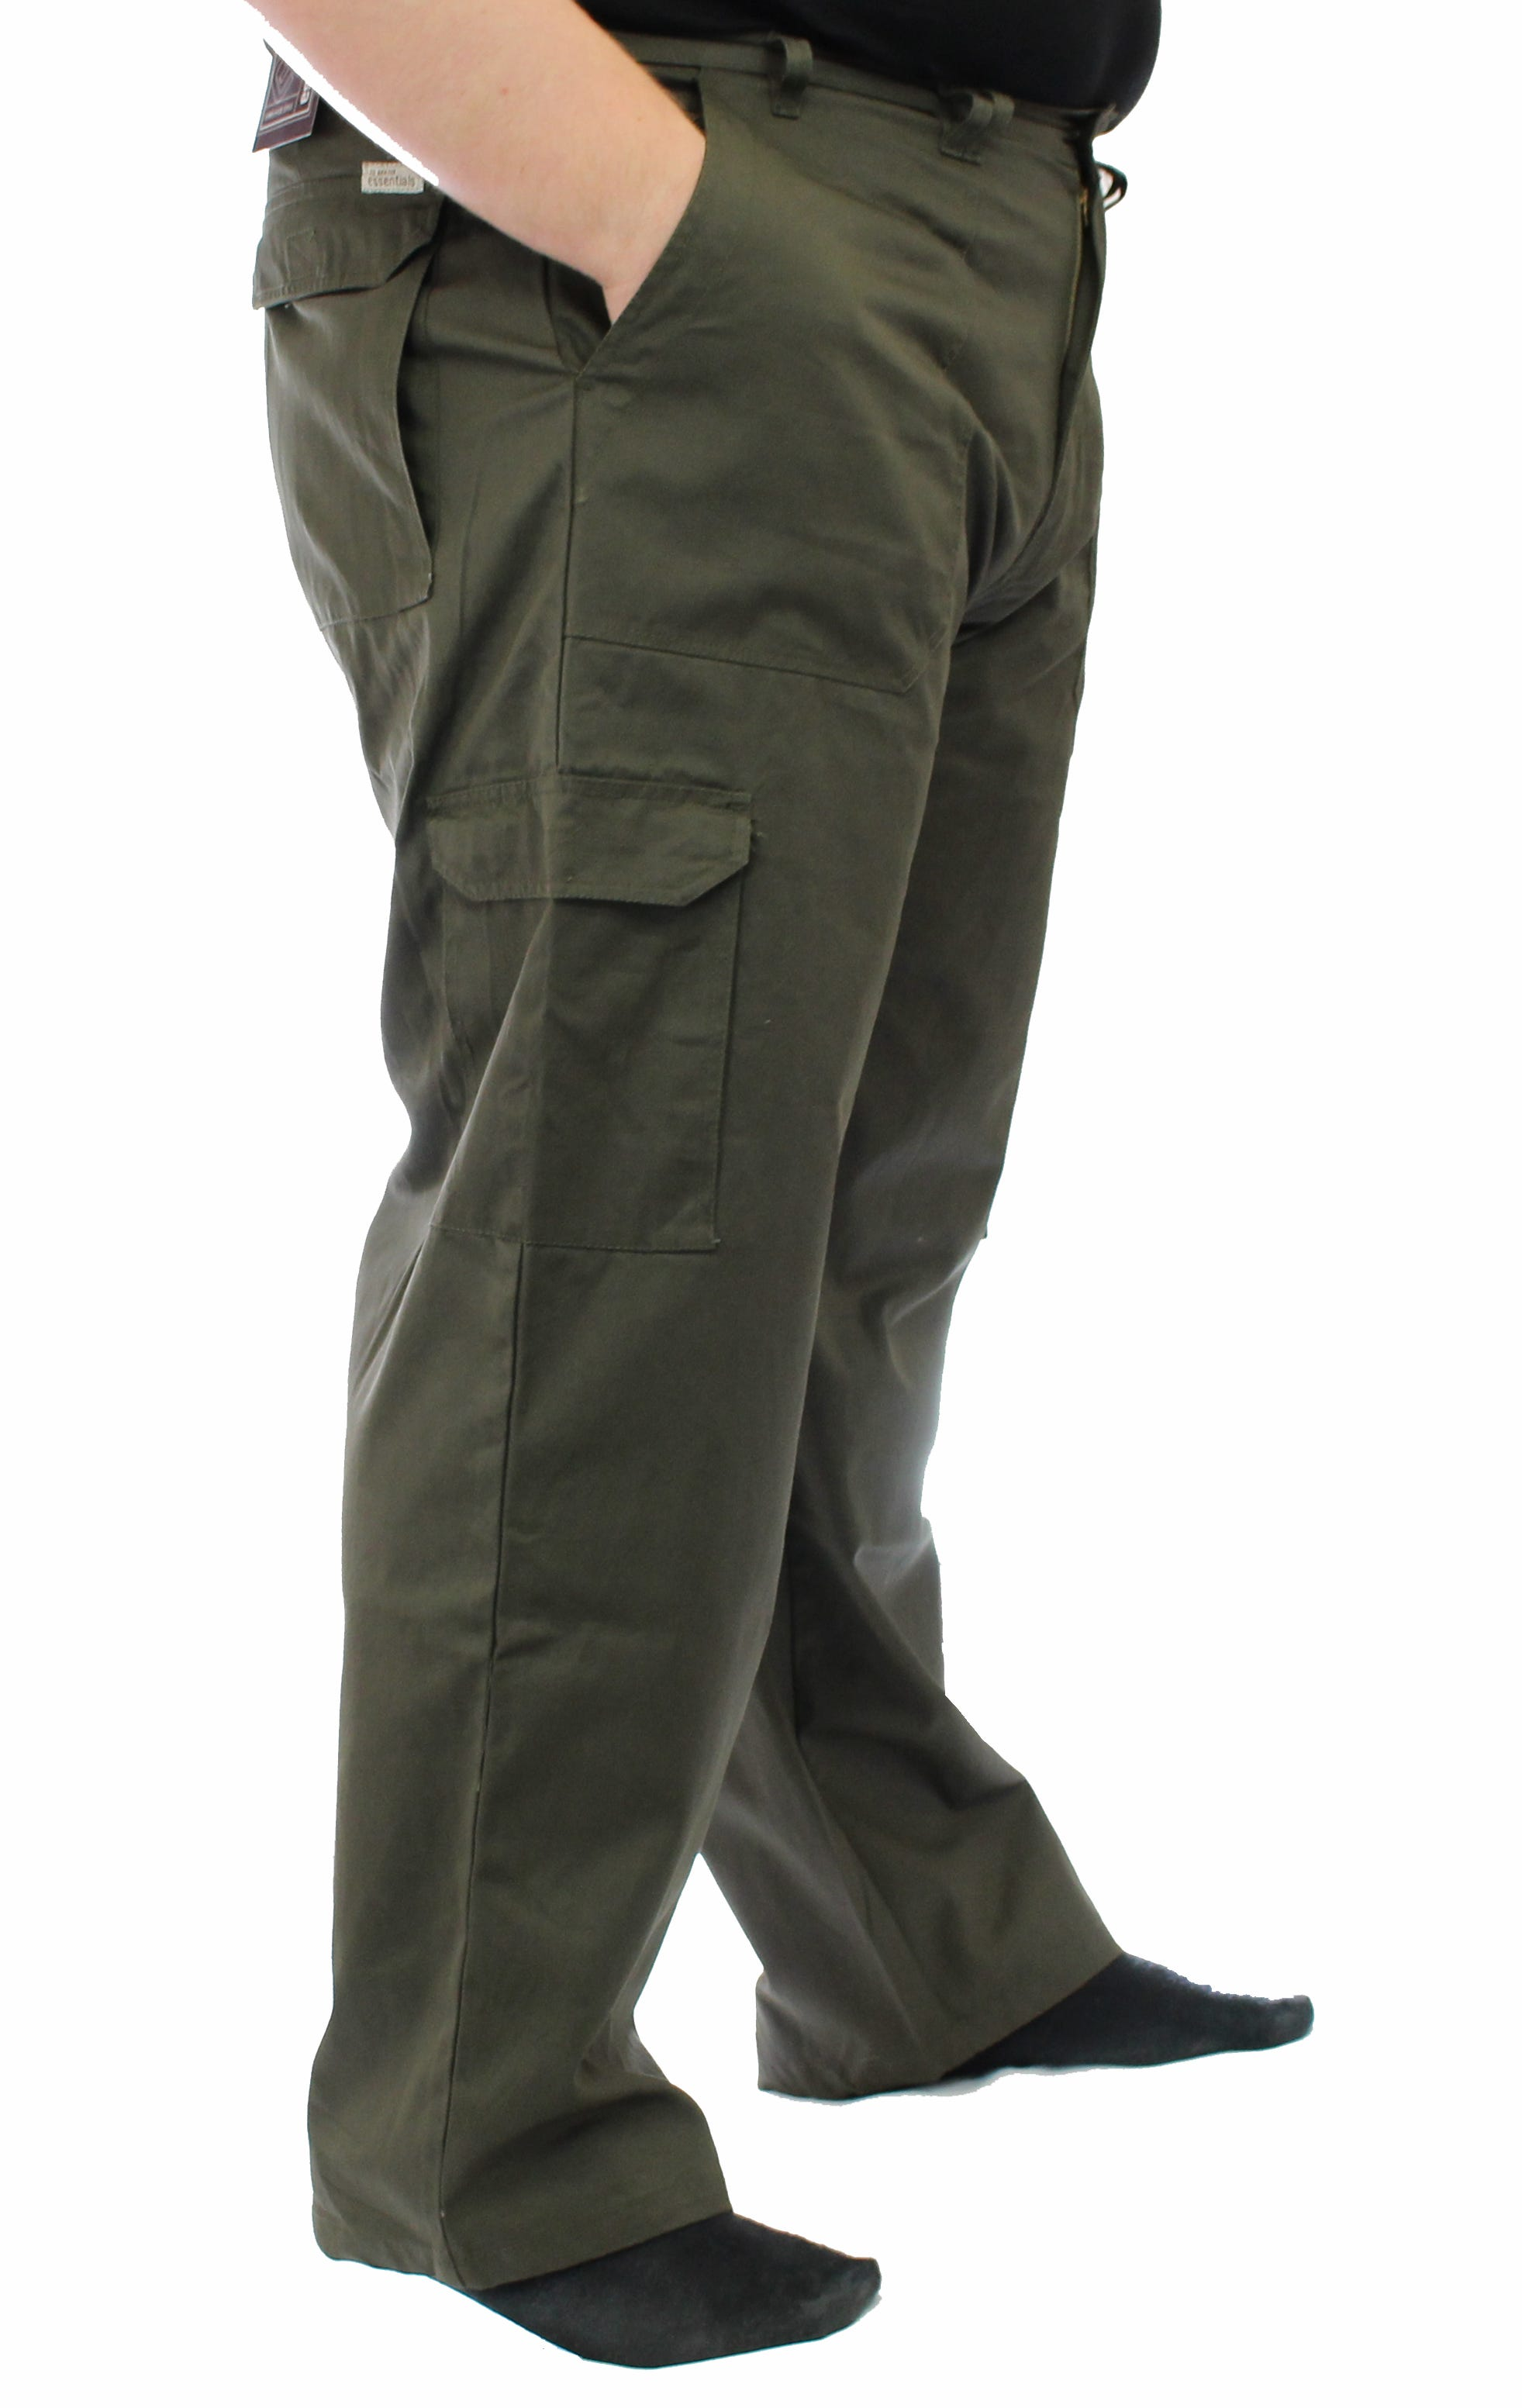 "Ed Baxter Victory - Heavy Duty Cargo Combat Trousers - Khaki - 62"" Waist, 34"" Leg"